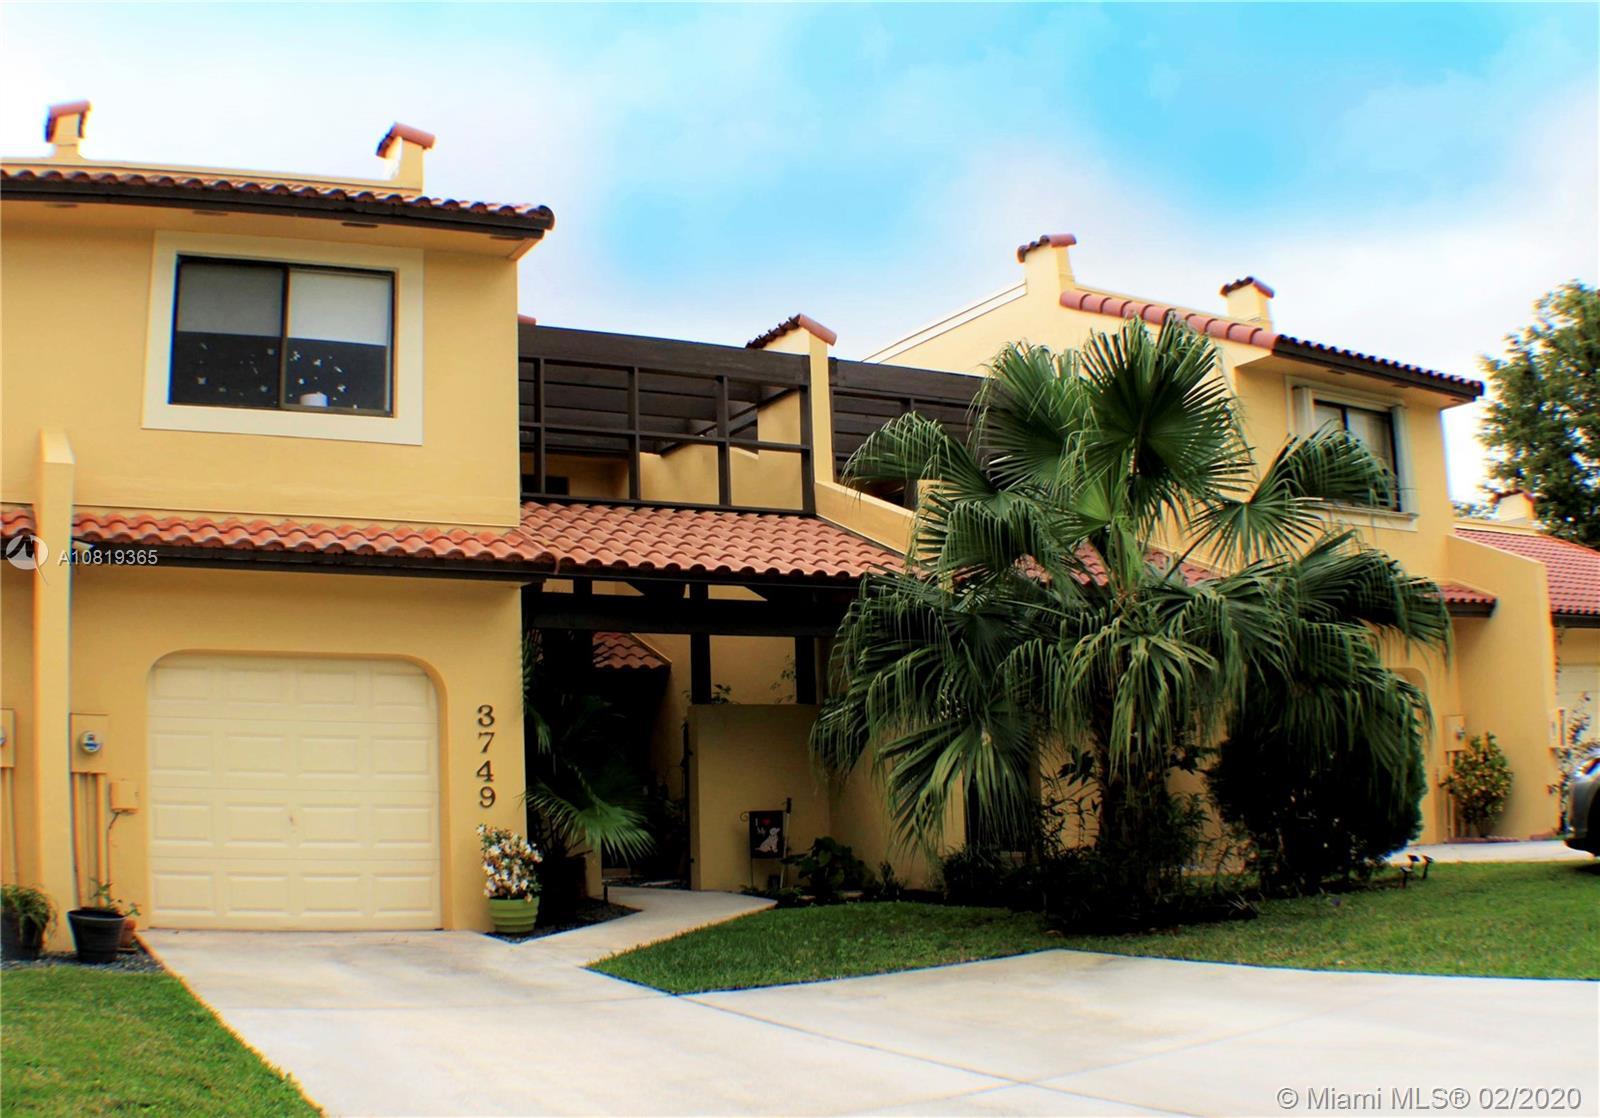 3749 Alcantara Ave #C-80, Doral, FL 33178 - Doral, FL real estate listing